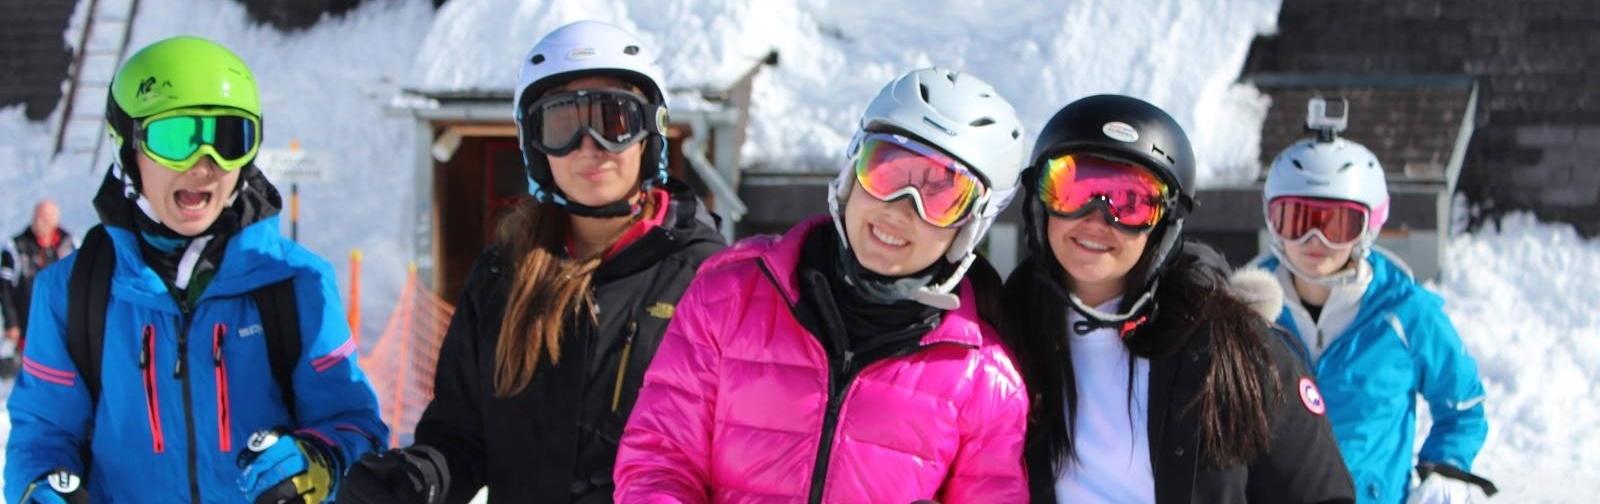 Swiss boarding school skiing in the alps